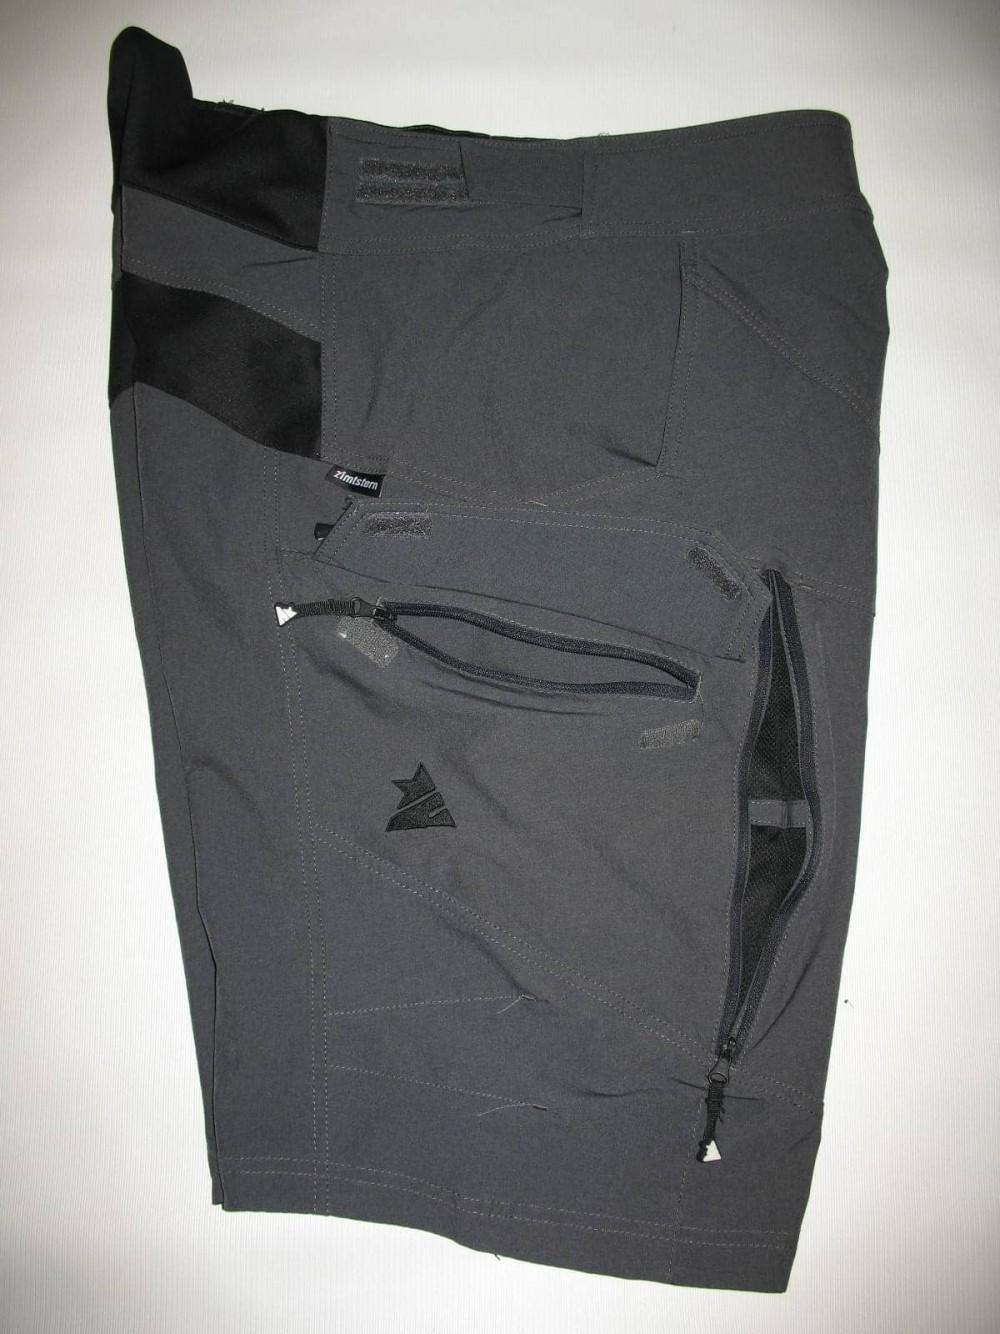 Велошорты ZIMTSTERN trailstar bike shorts (размер L) - 10